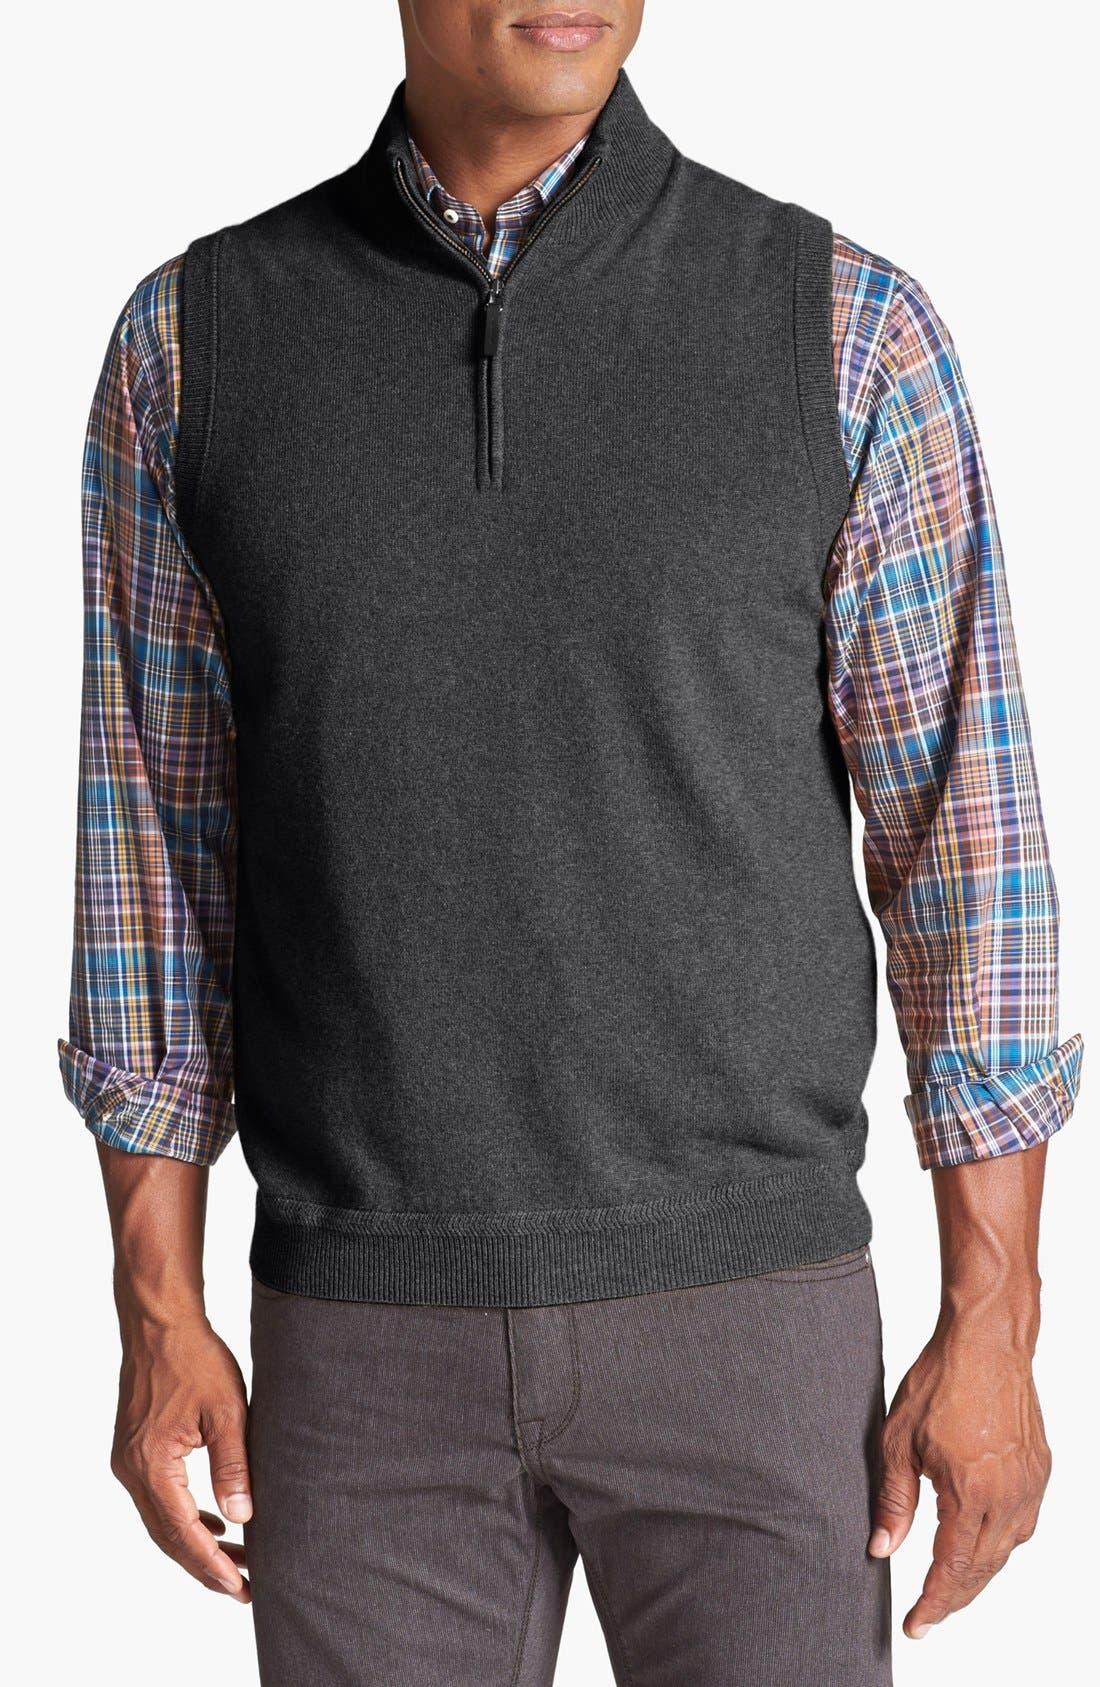 Alternate Image 1 Selected - John W. Nordstrom® Half Zip Cashmere Vest